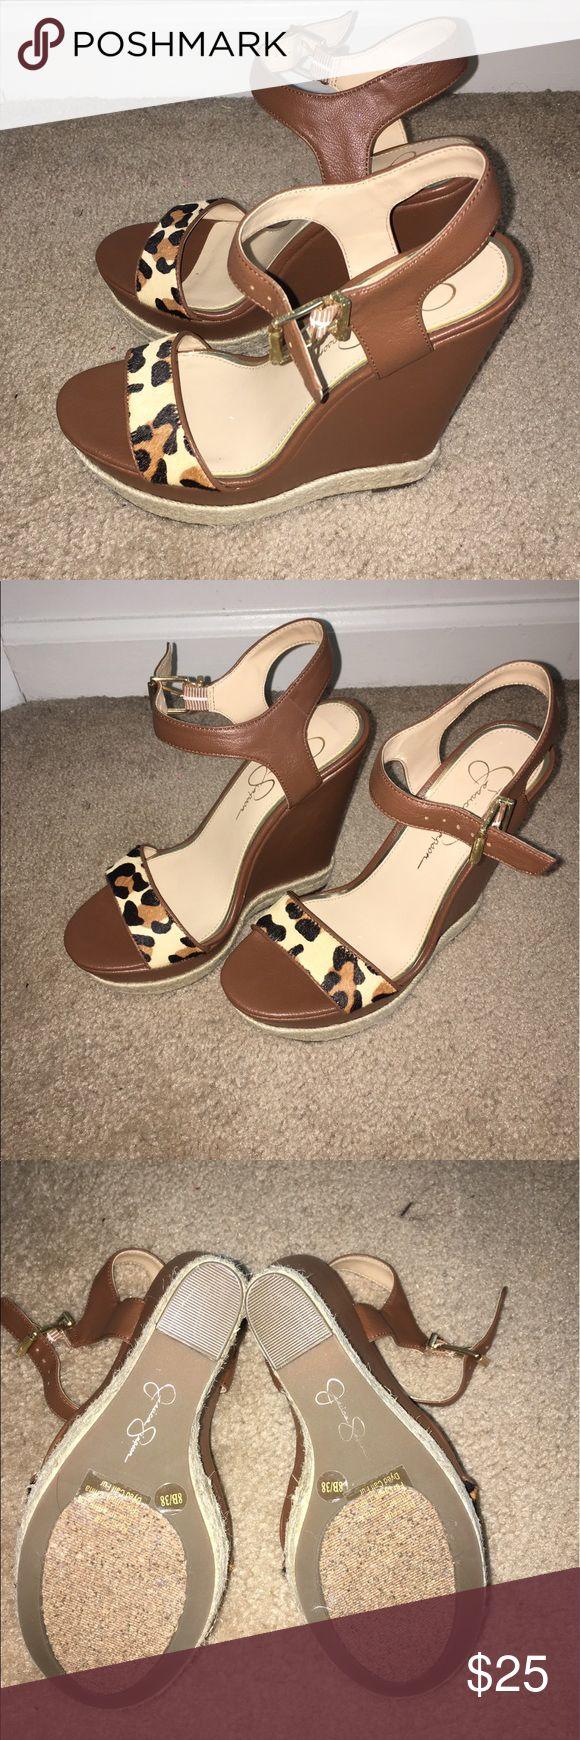 Jessica Simpson wedges Beautiful cognac/cheetah wedges never worn out before Jessica Simpson Shoes Wedges